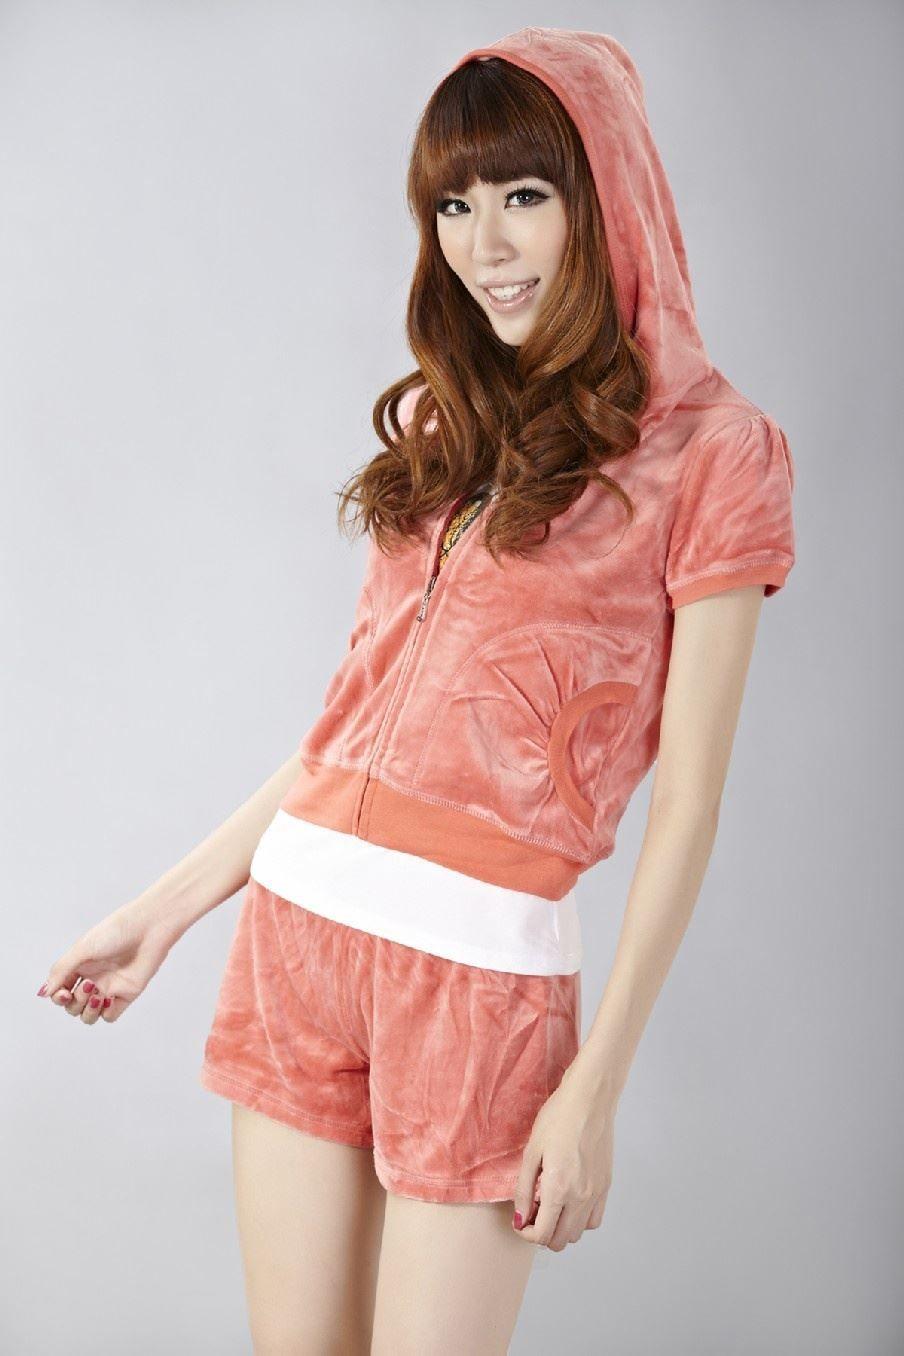 Wholesale - 5sets/lot Pink Velour Hoodie Tracksuits Short Sleeved Top & Pants Sweatsuit Summer Shortie Sets Jogging Suits Brand For Women